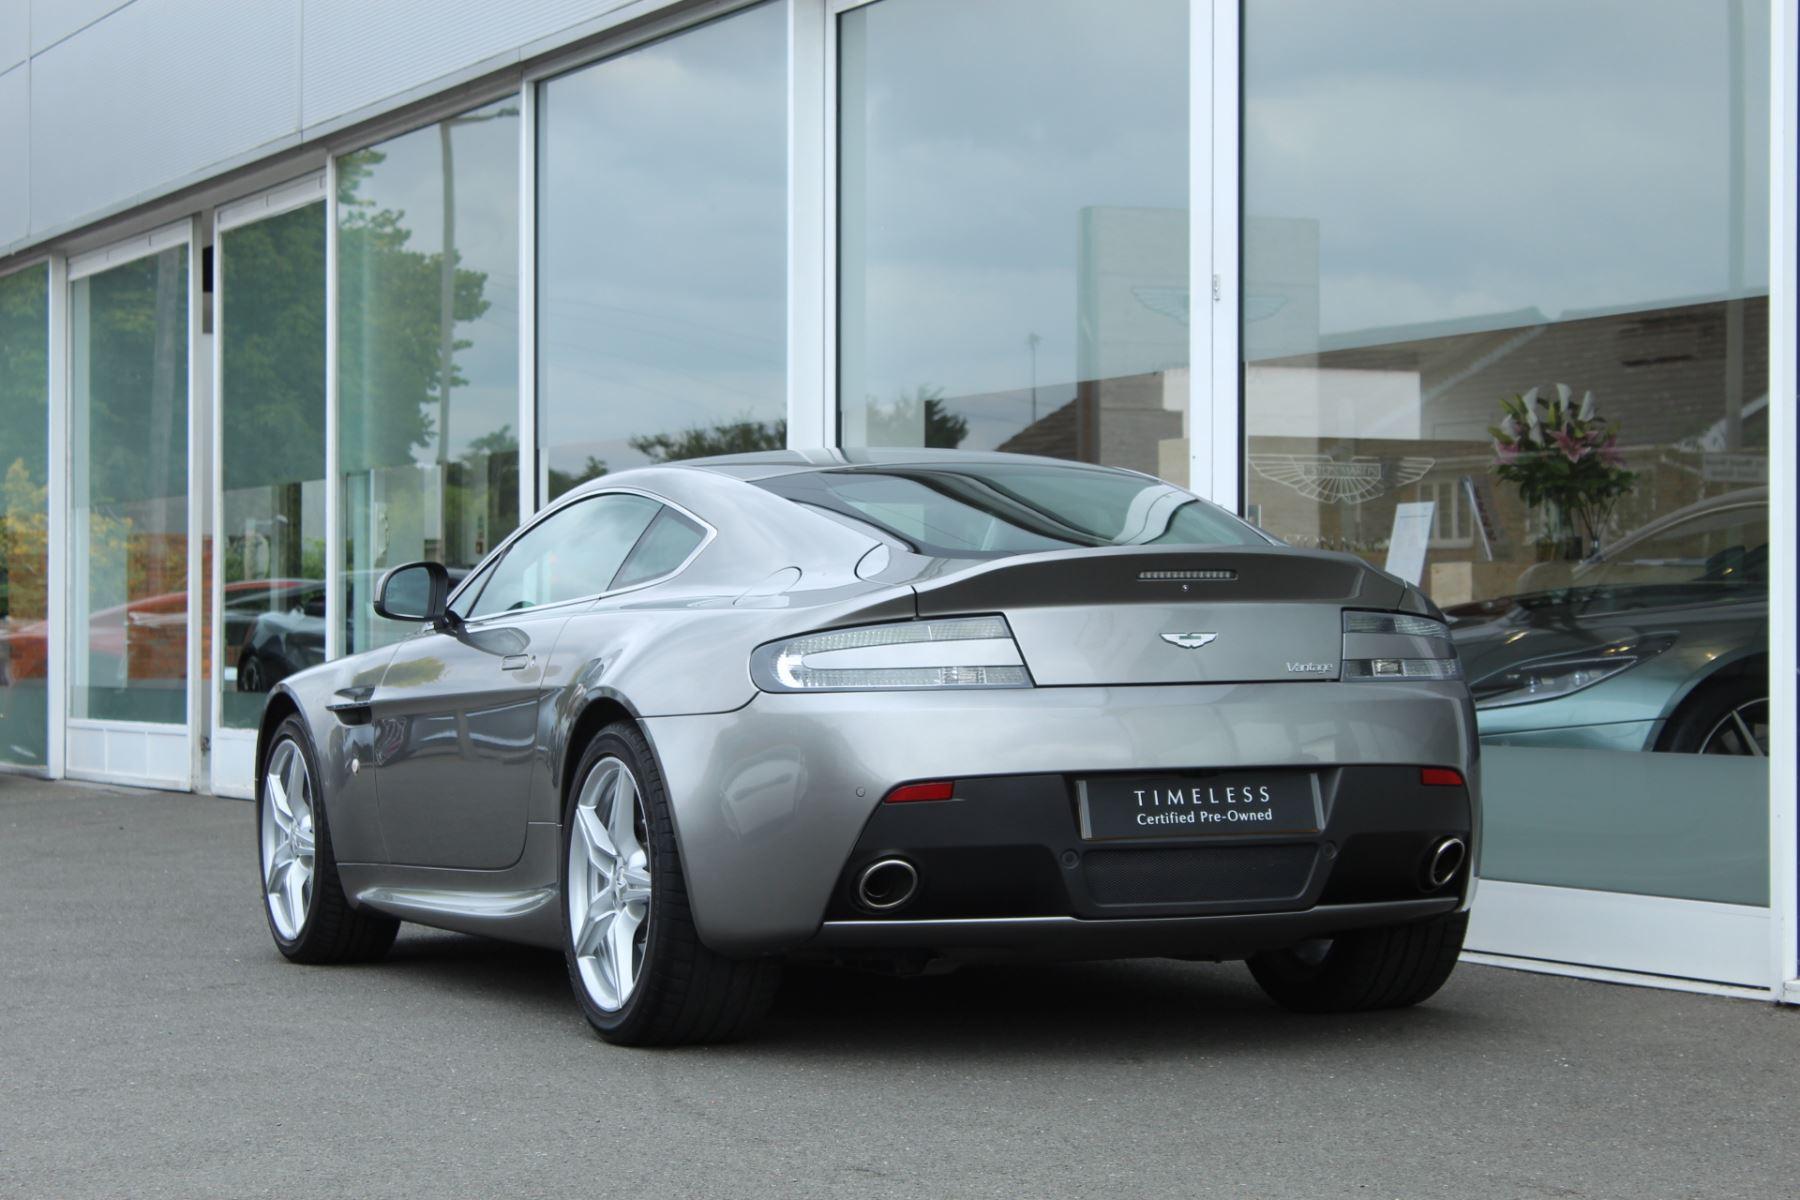 Aston Martin V8 Vantage Coupe 2dr Sportshift [420] image 14